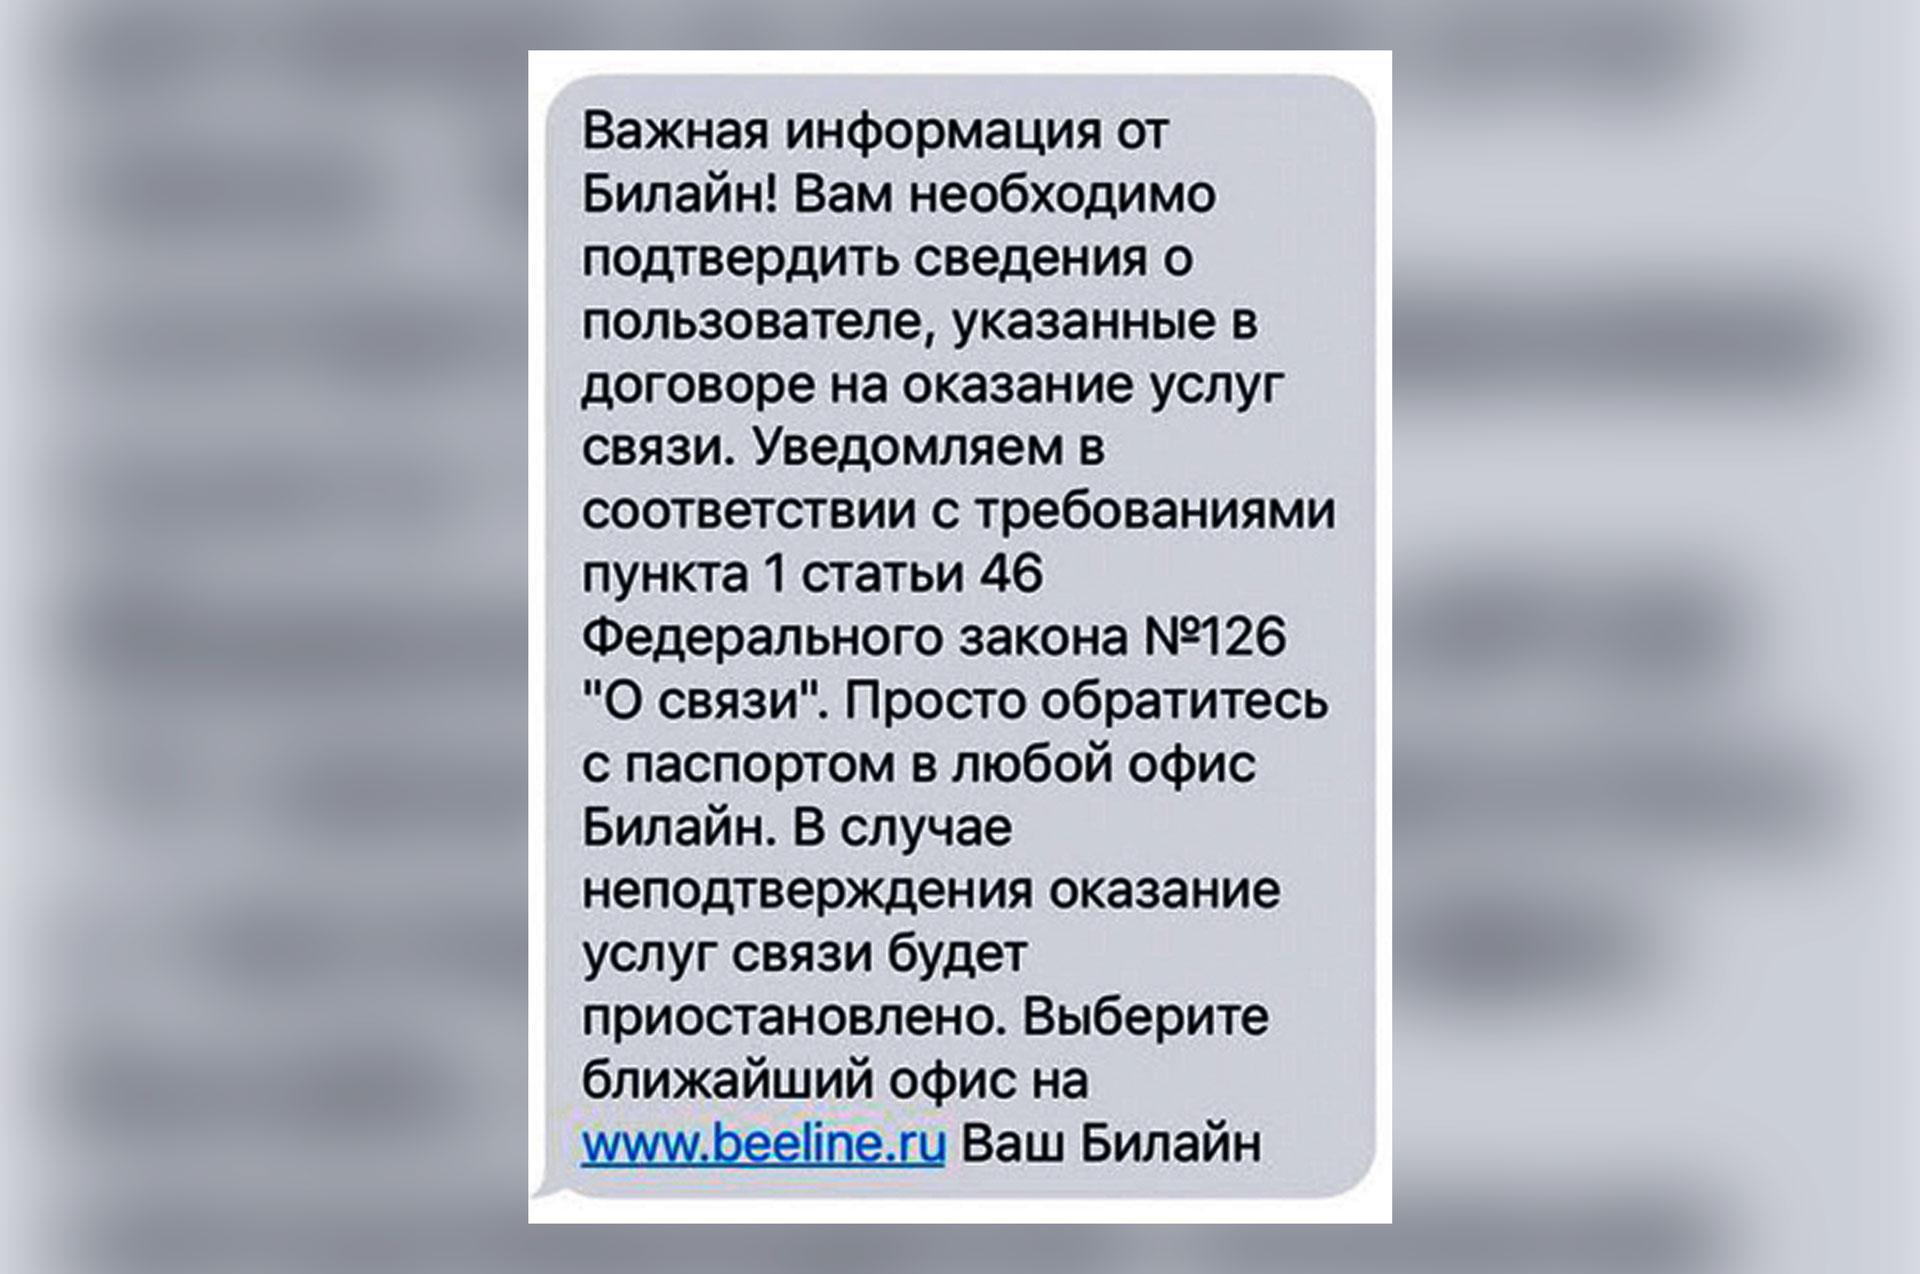 © twitter.com / Prostoy Peterburzhec